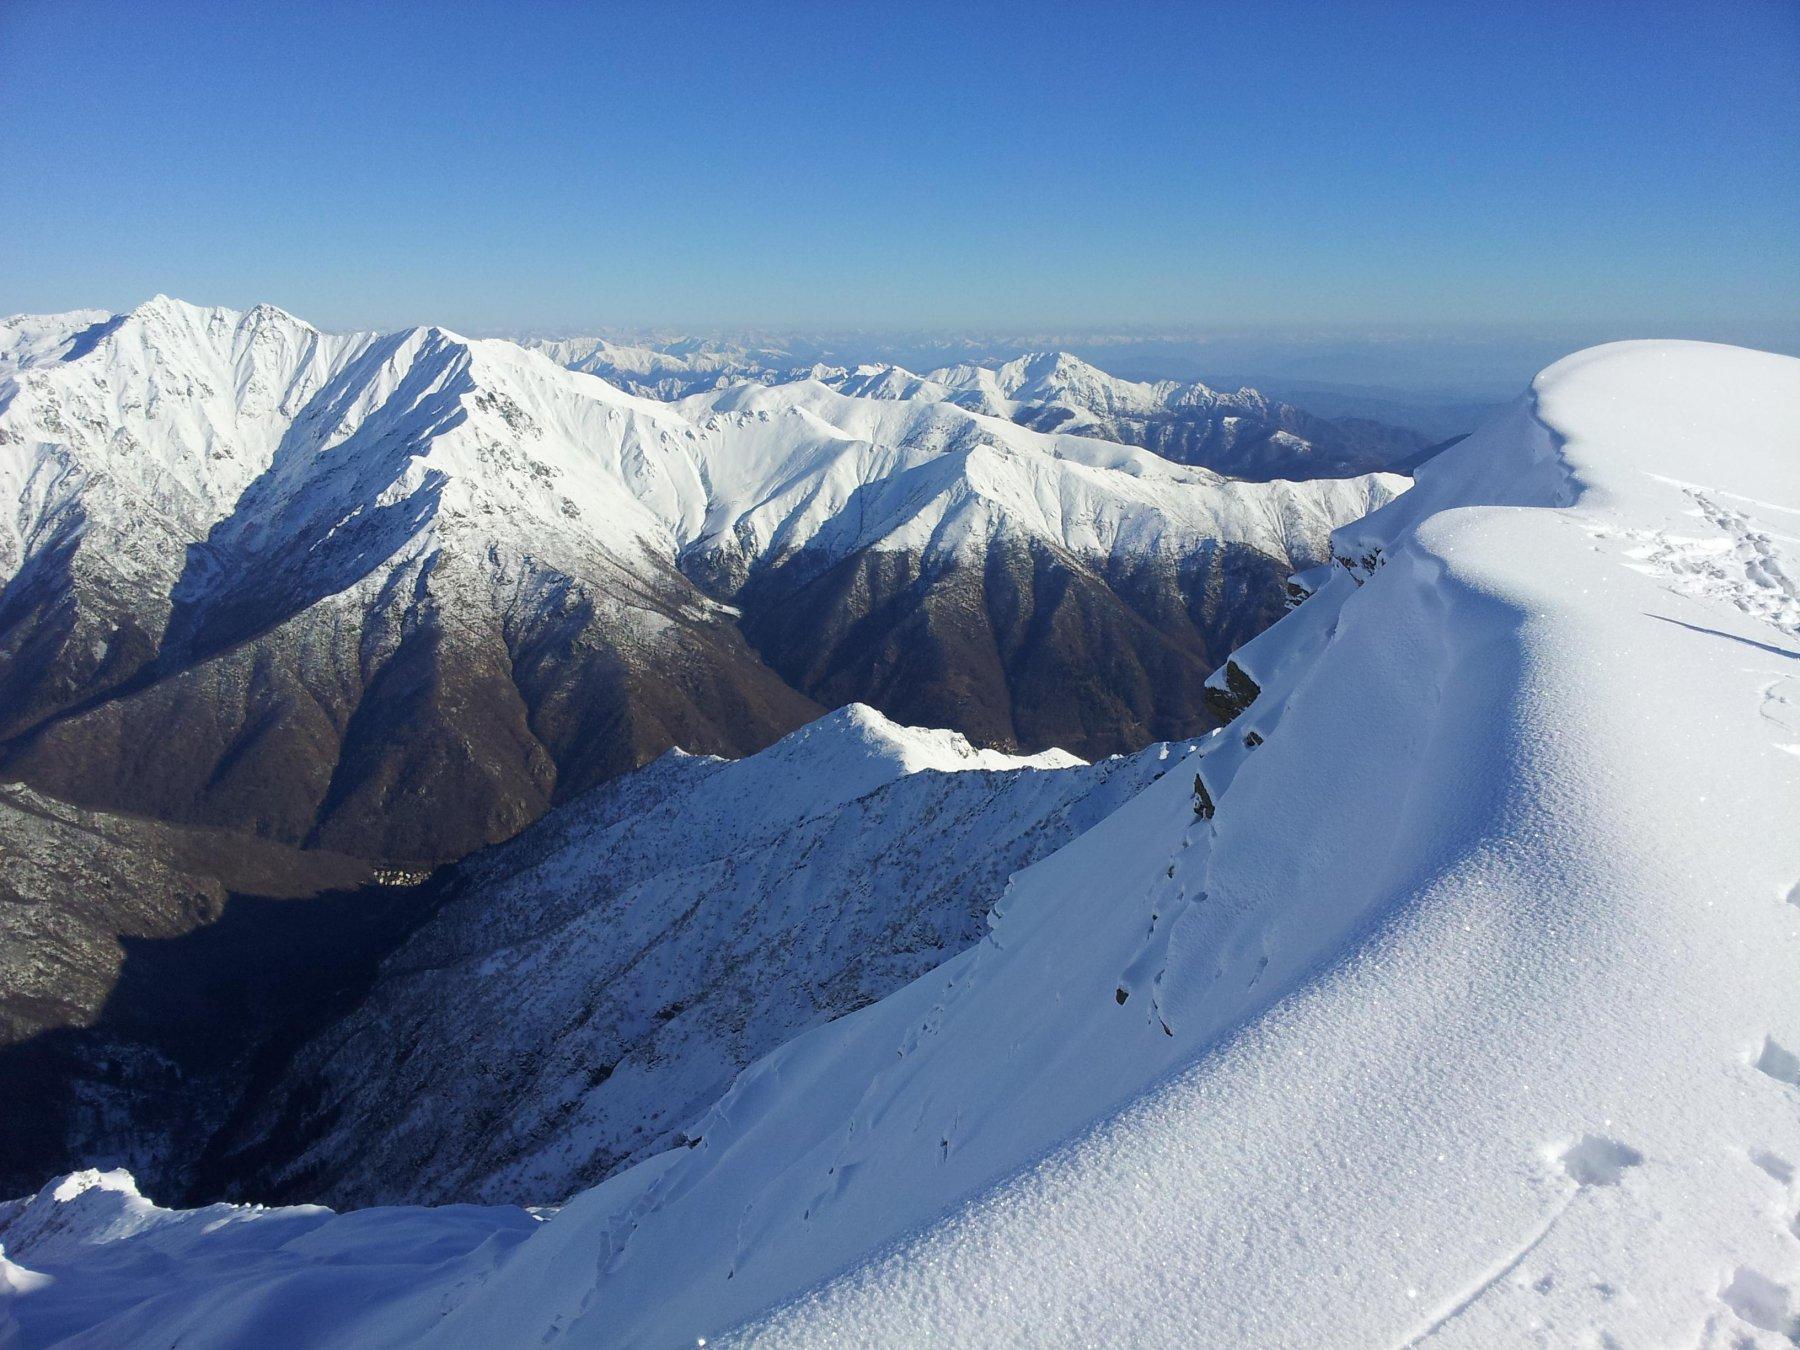 Livello neve in Valle Cervo